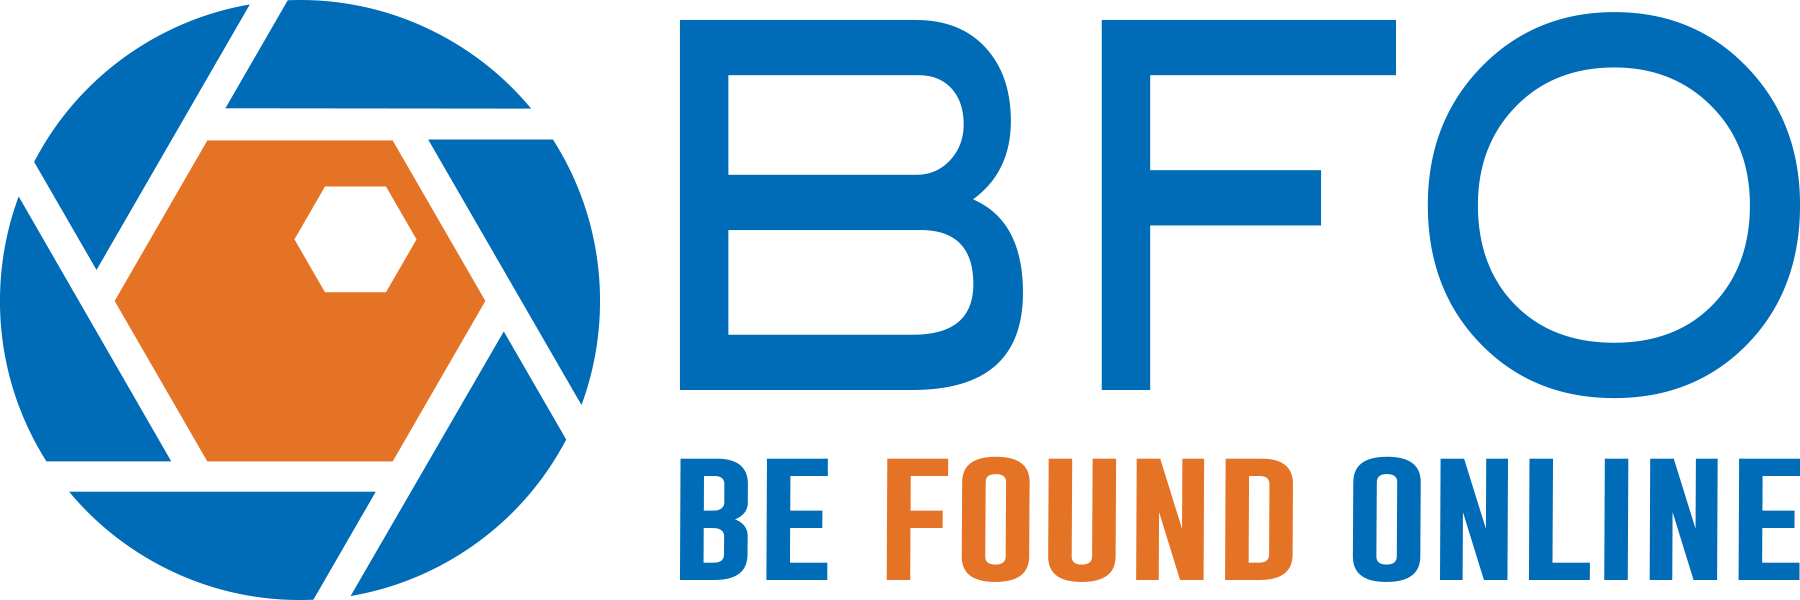 Klipfolio Partner | BFO (Be Found Online)